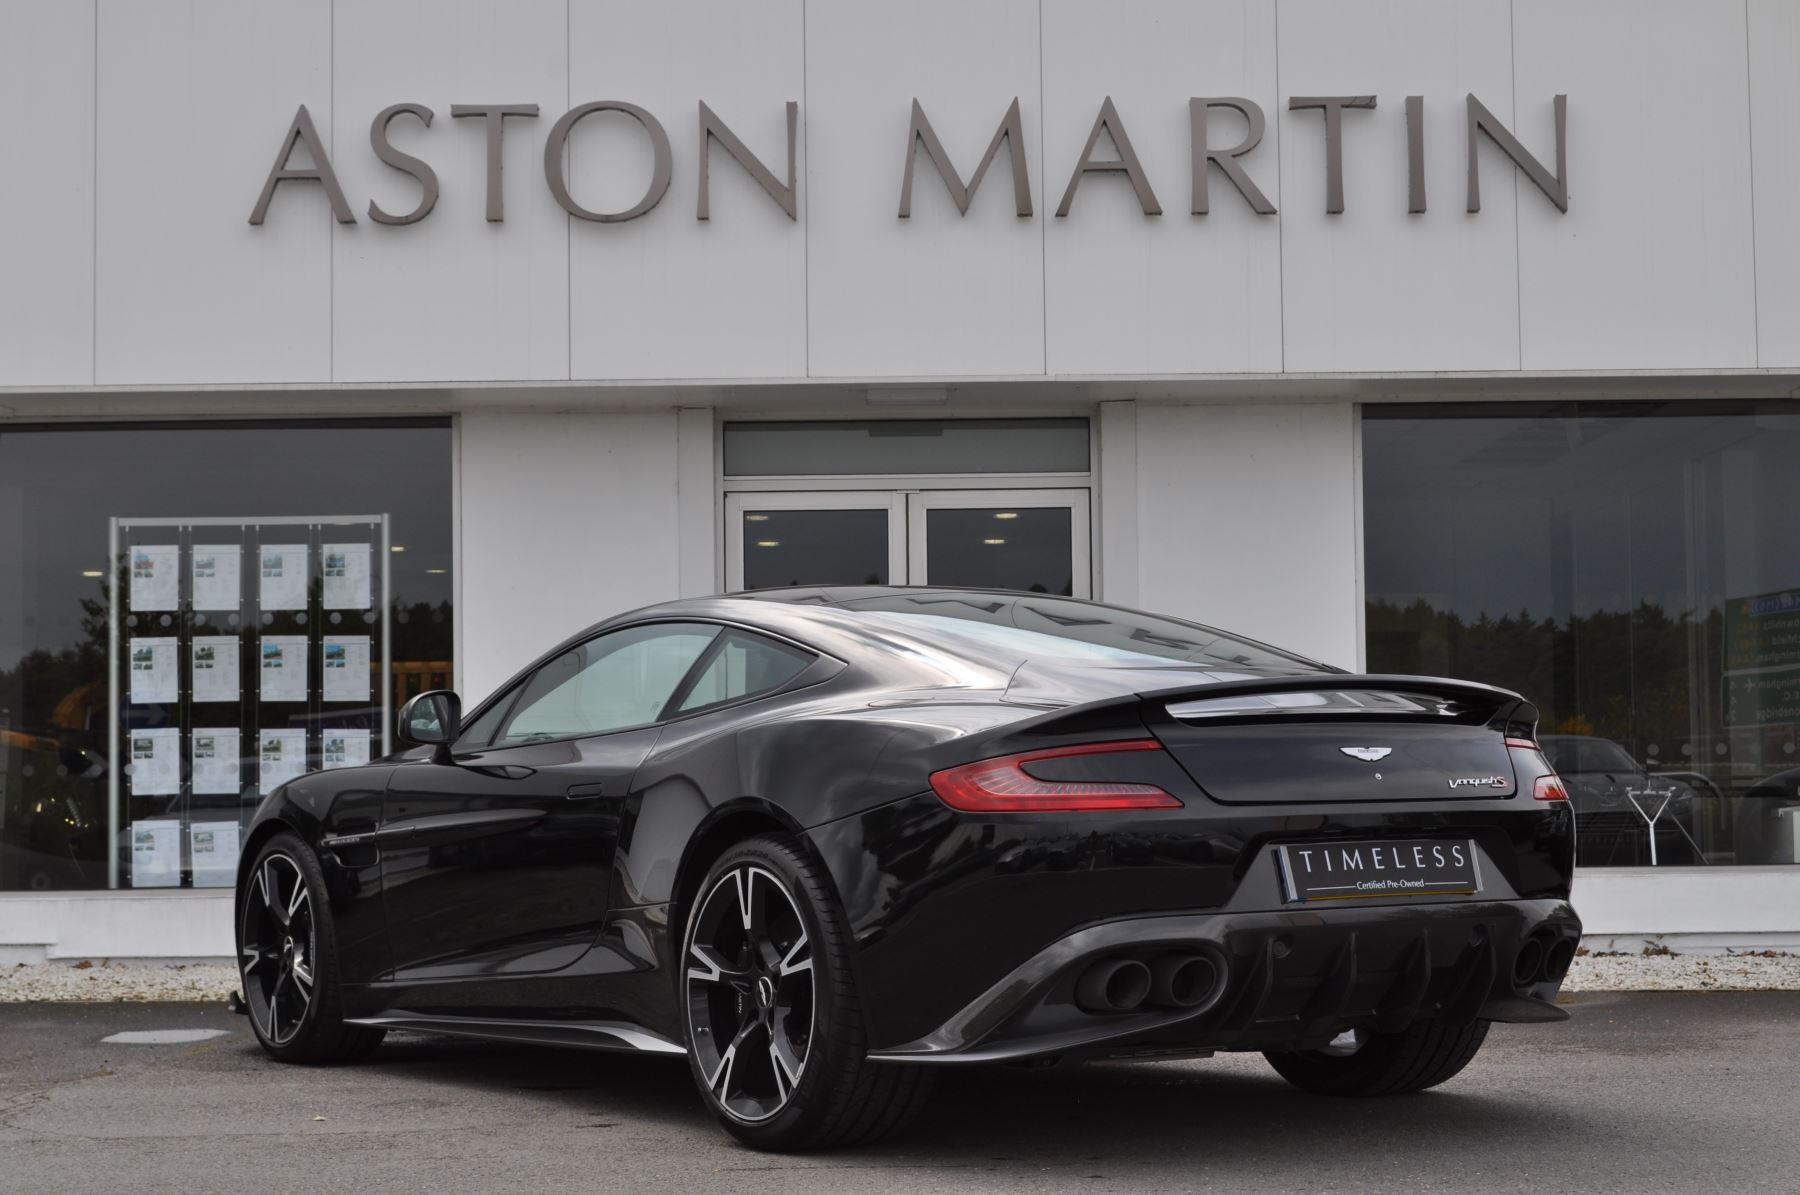 Aston Martin Vanquish S V12 [595] S 2+2 2dr Touchtronic image 7